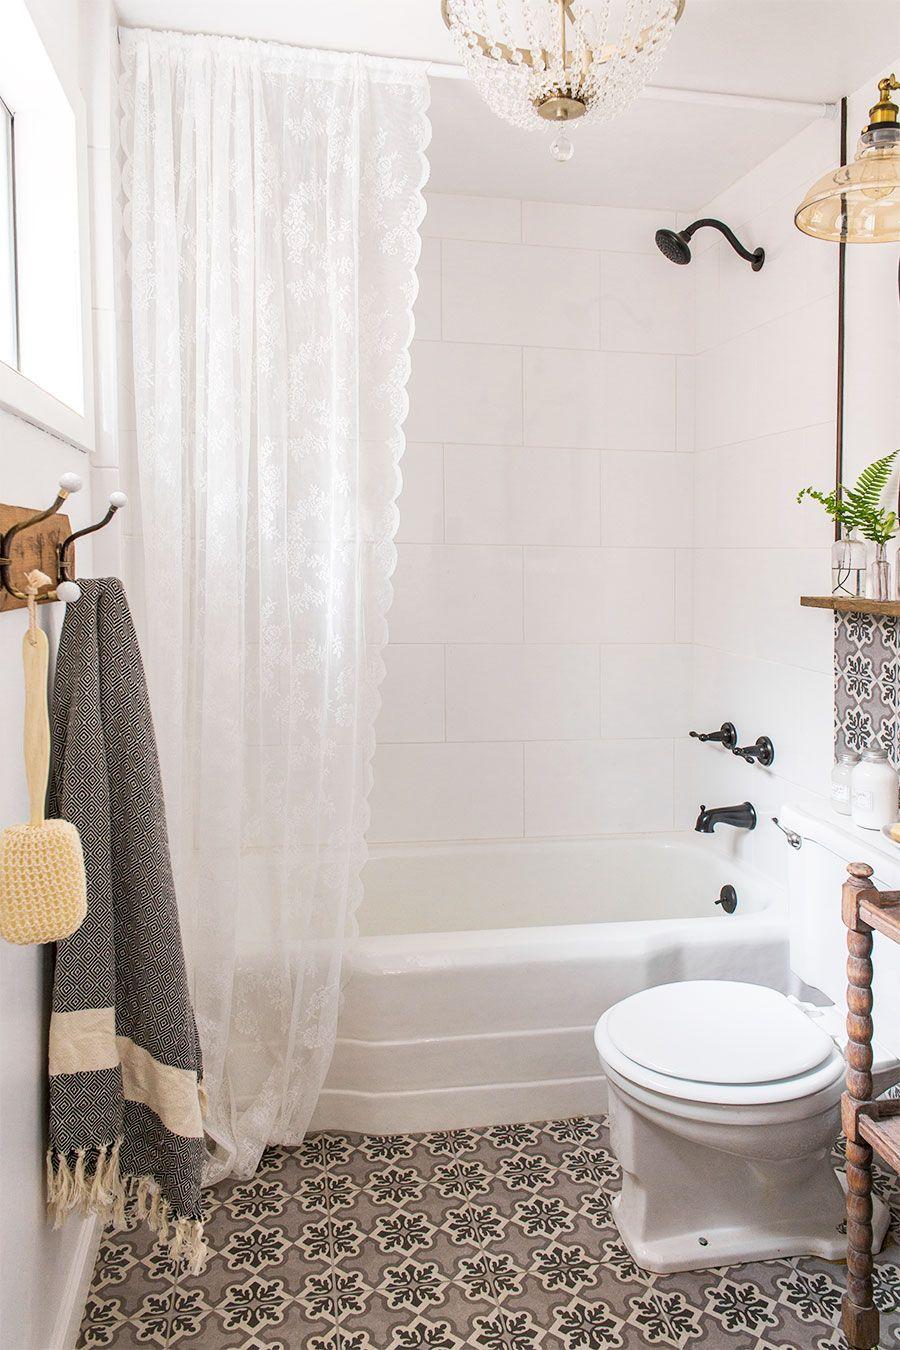 Downstairs Bathroom: Cottage House Flip Reveal | Pinterest ...